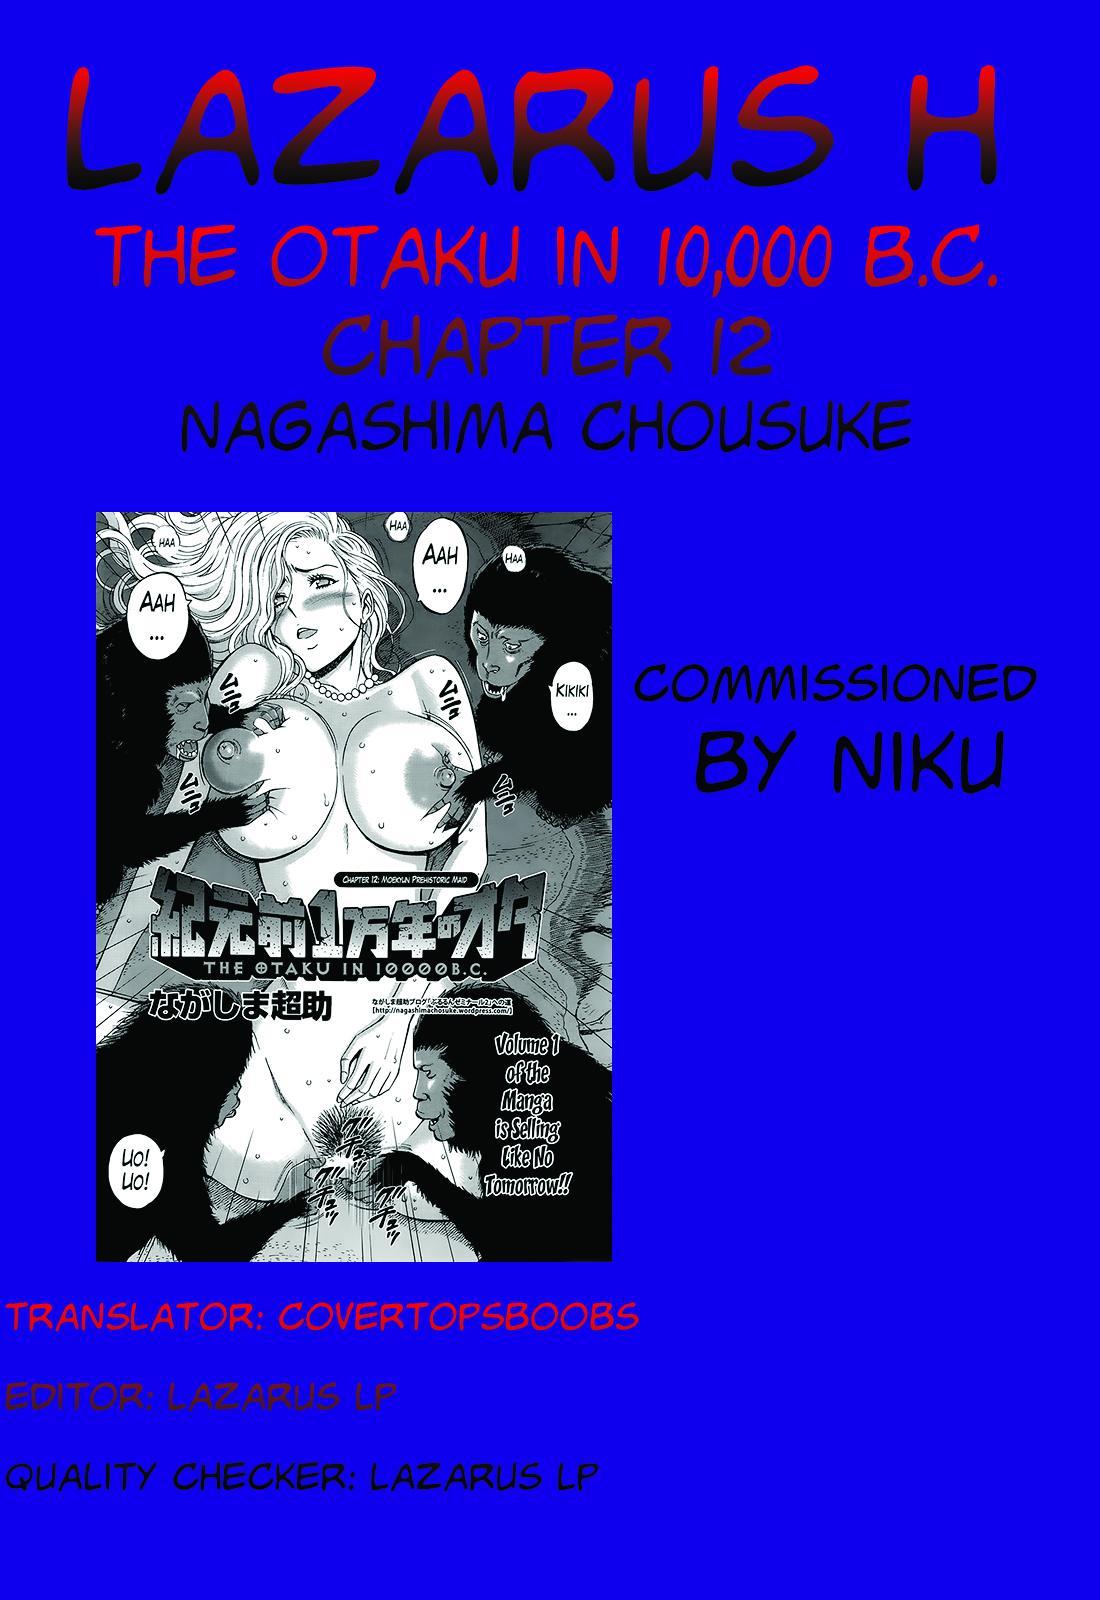 Kigenzen 10000 Nen no Ota | The Otaku in 10,000 B.C. 233